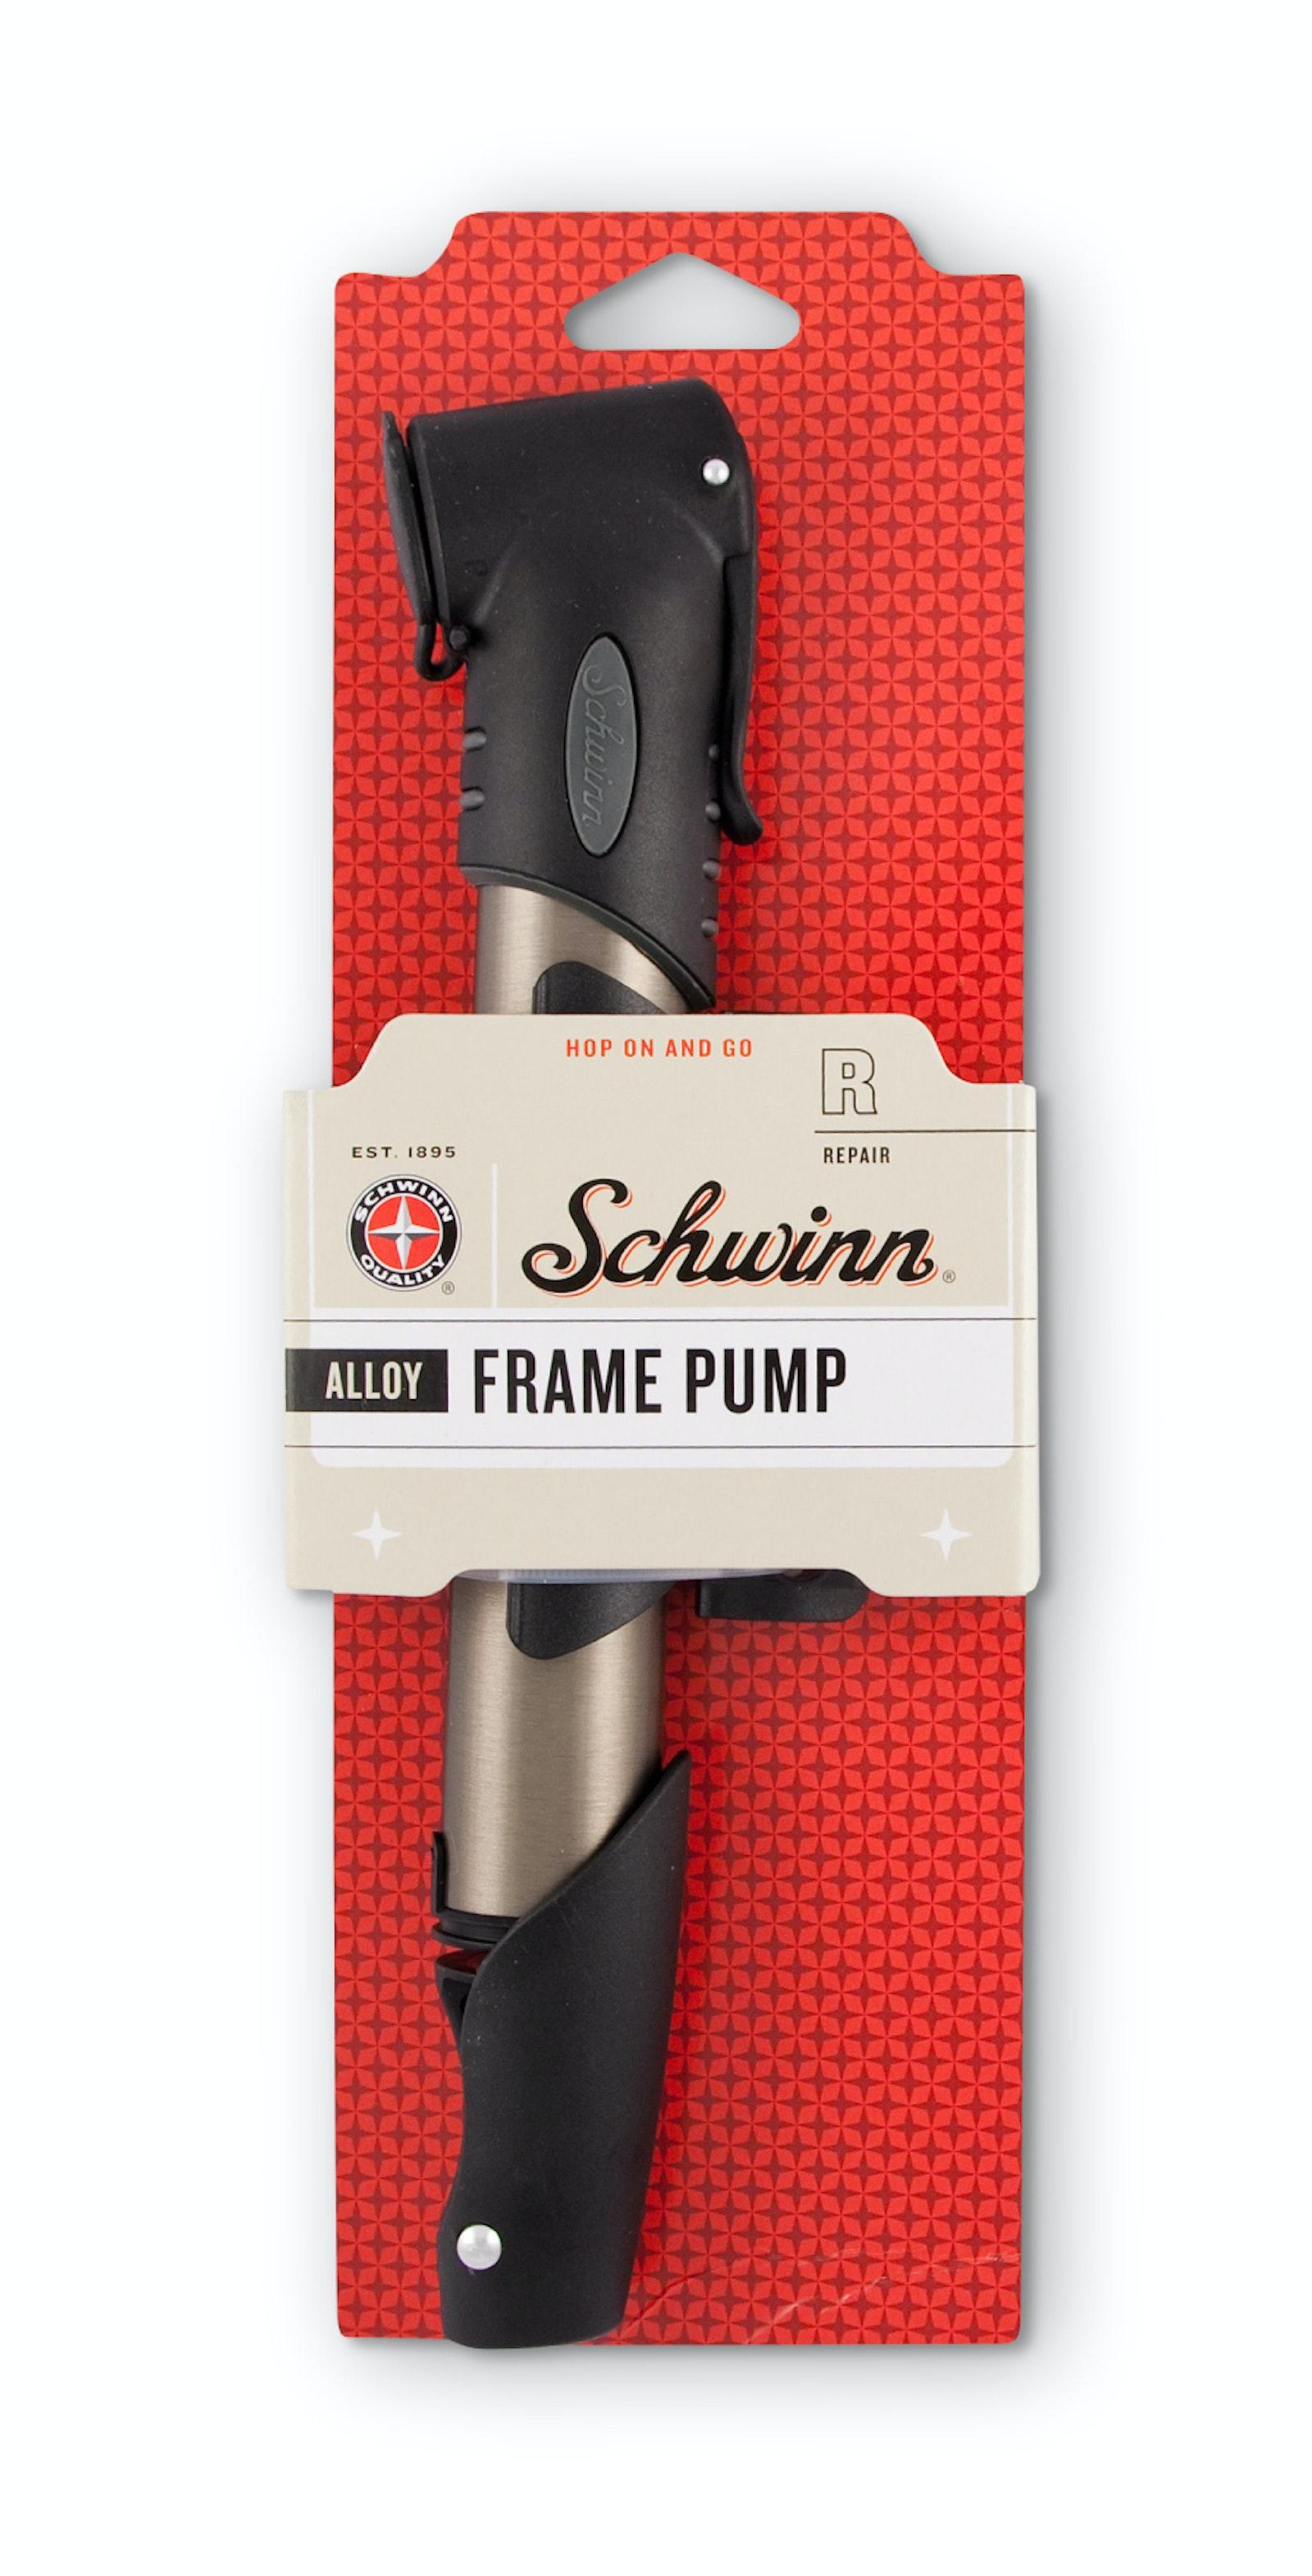 Schwinn frame